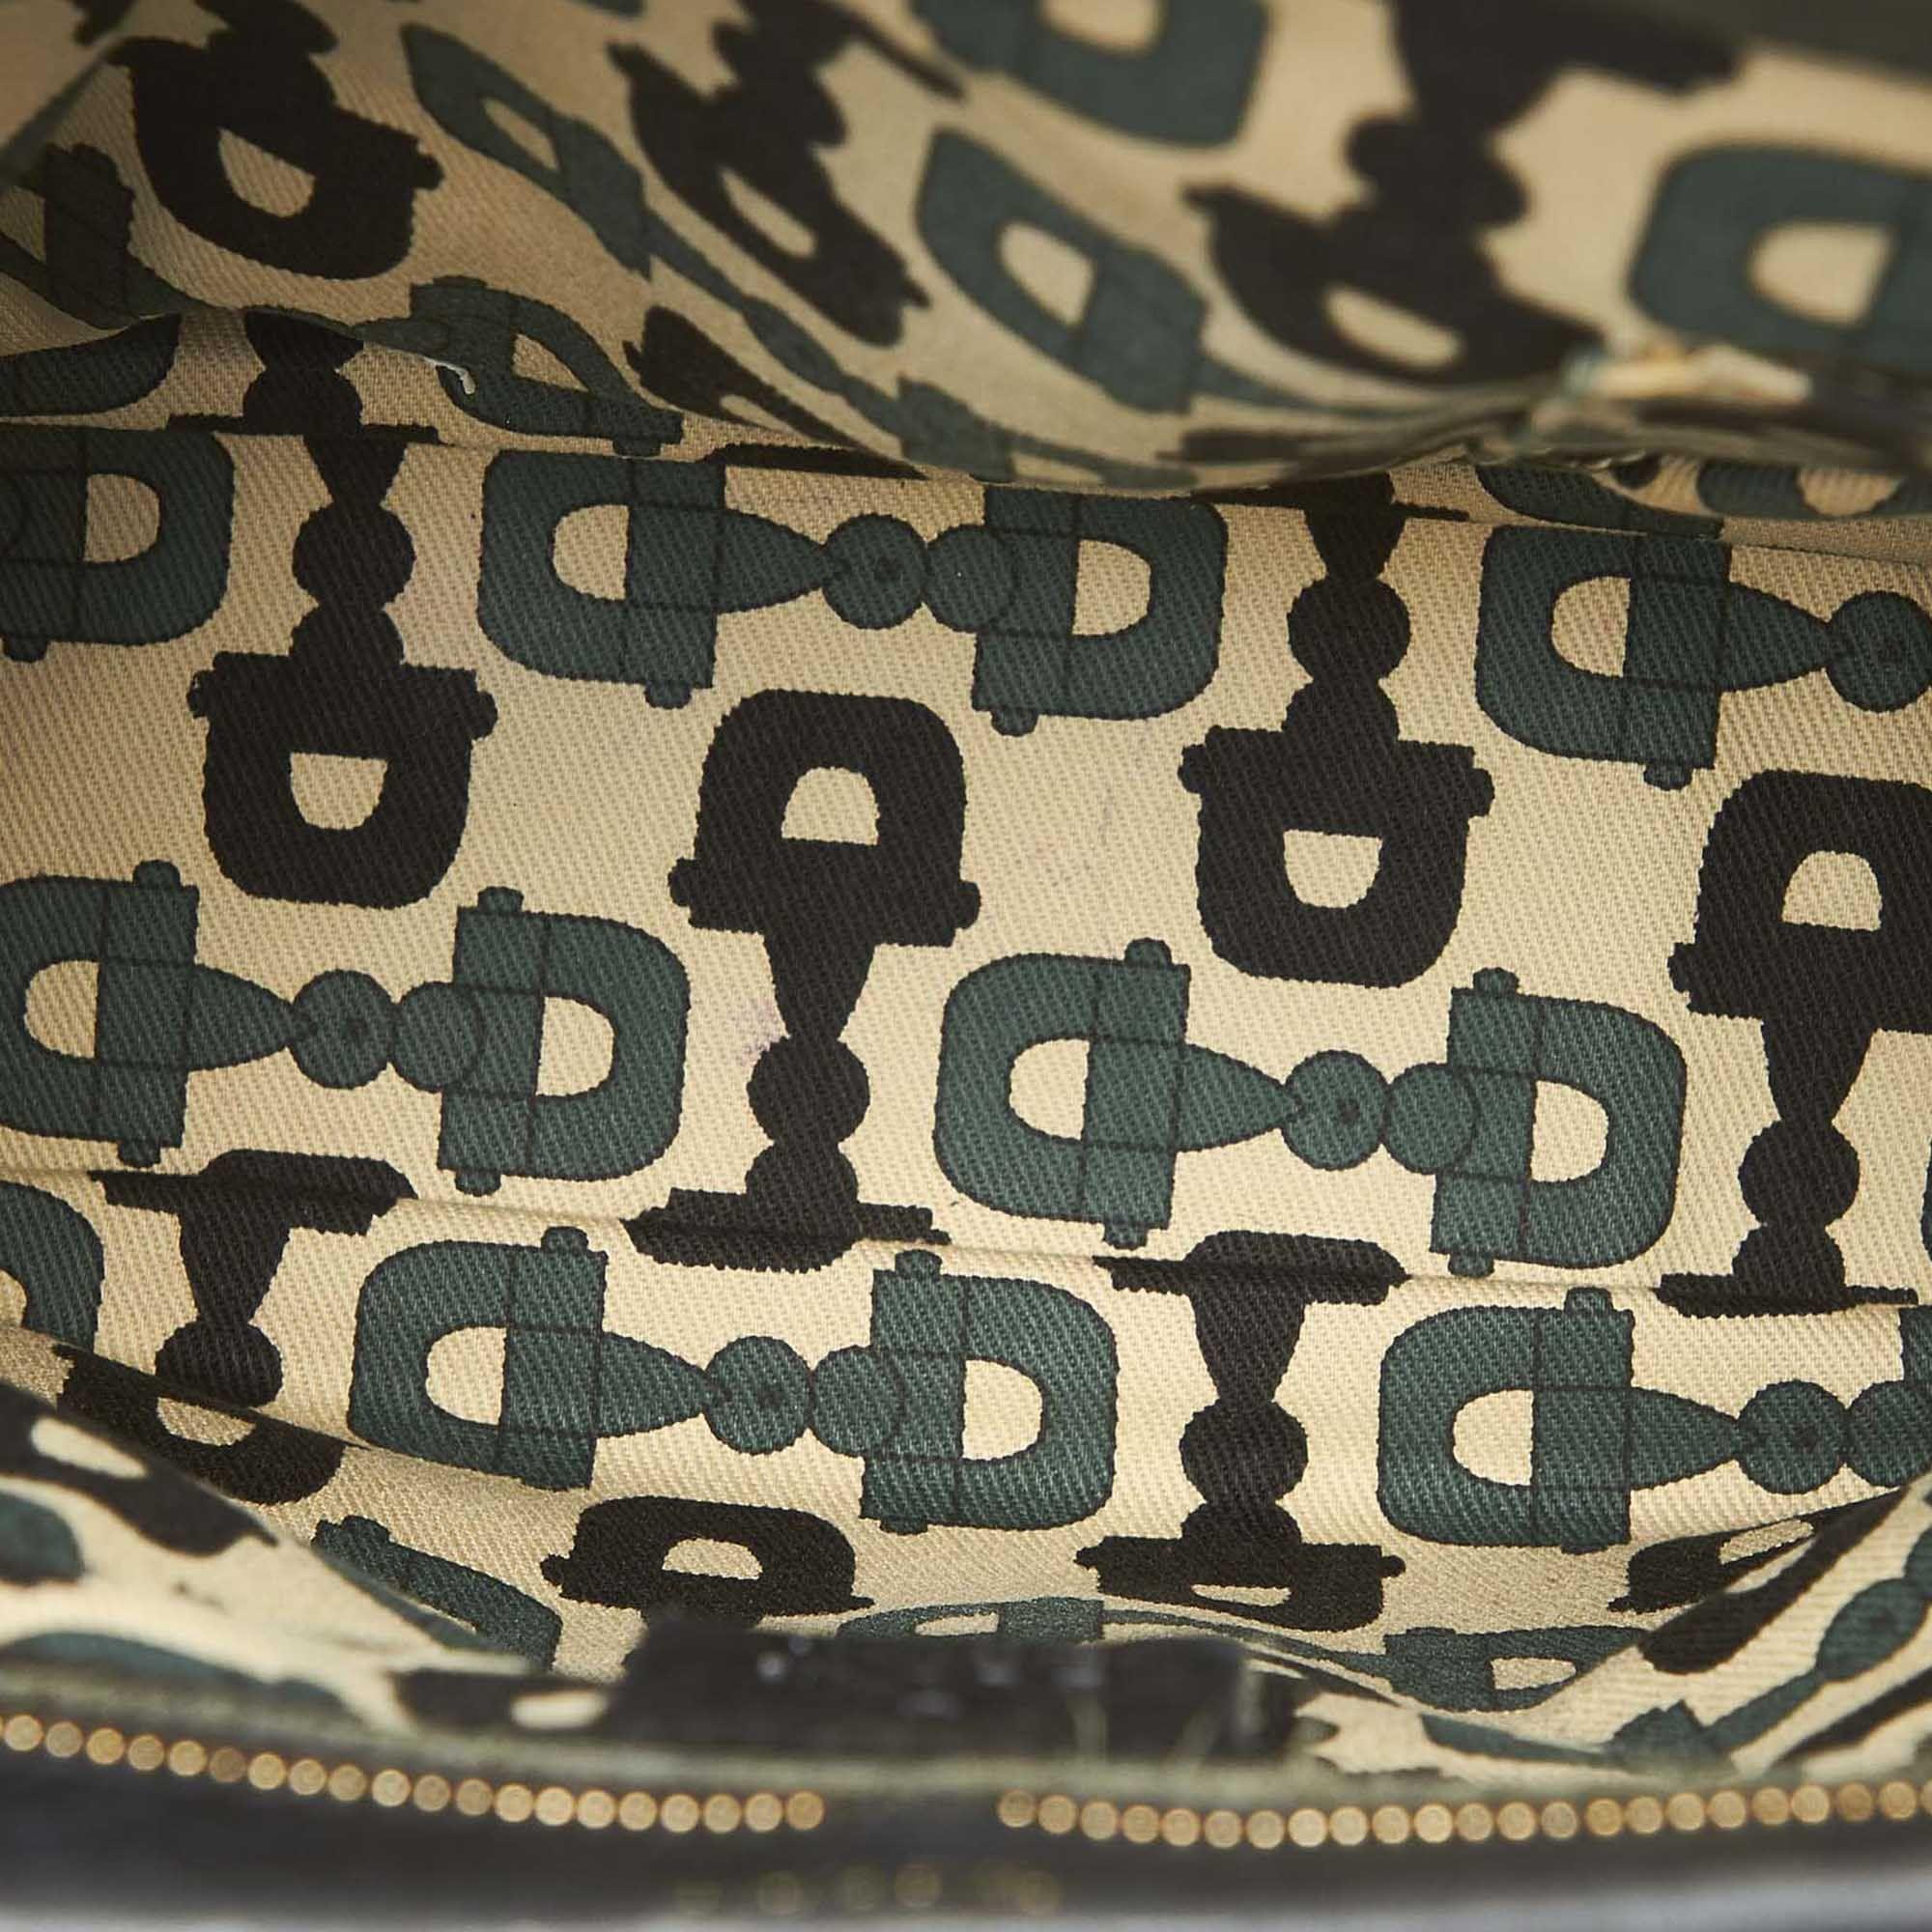 Vintage Gucci Guccissima New Jackie Handbag Black